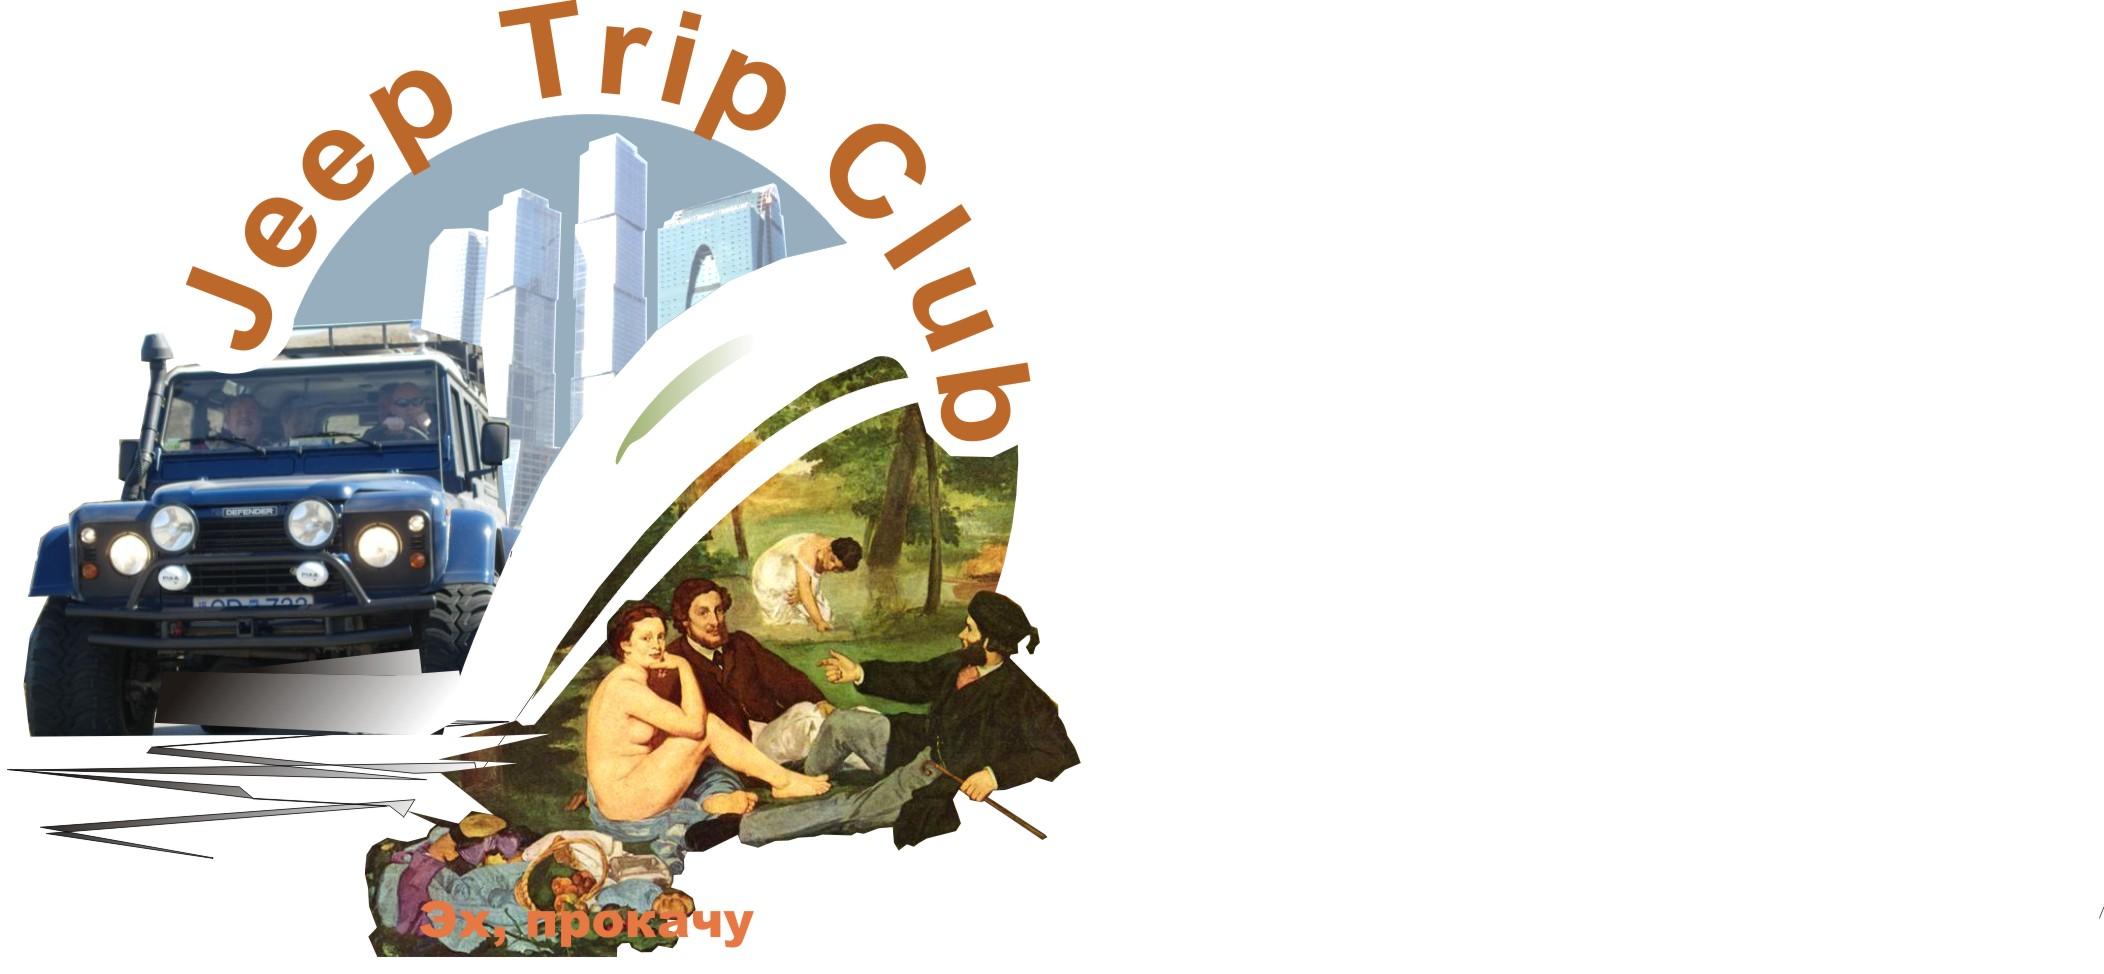 Создать или переработать логотип для Jeep Trip Club фото f_1315432d4b896a97.jpg